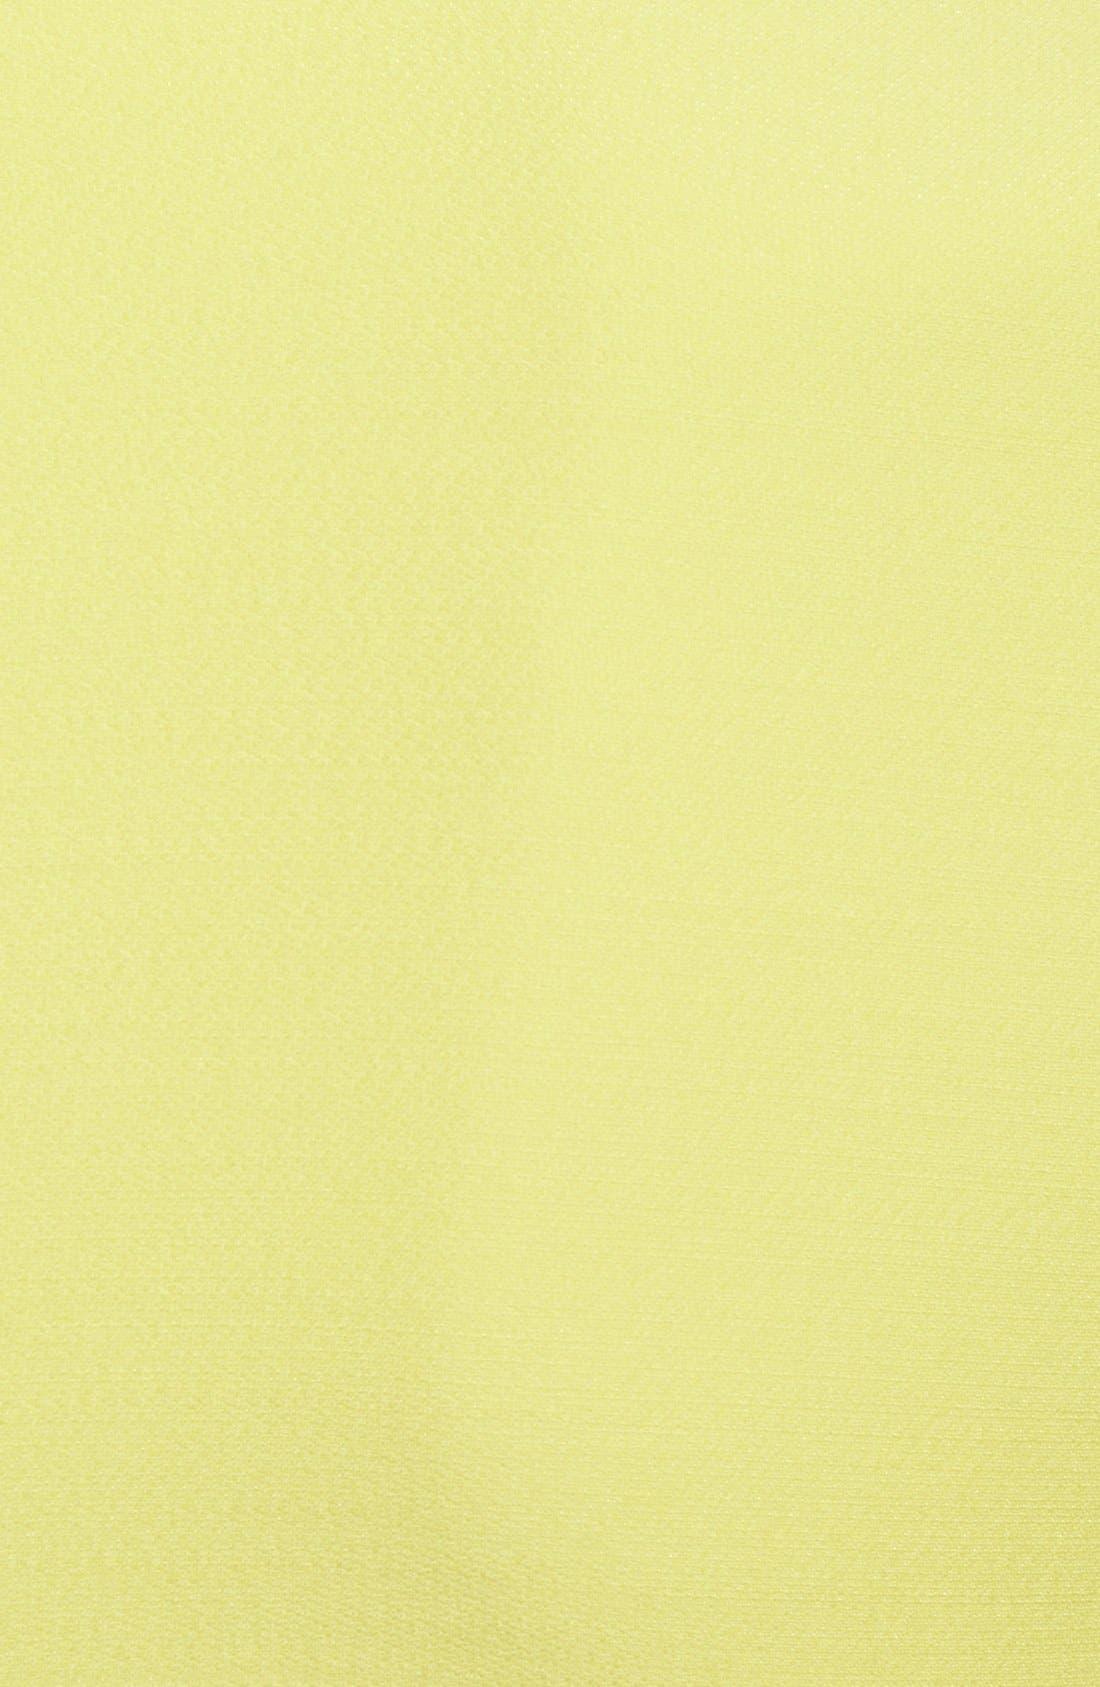 Alternate Image 3  - Valentino Bow Detail Crepe Minidress